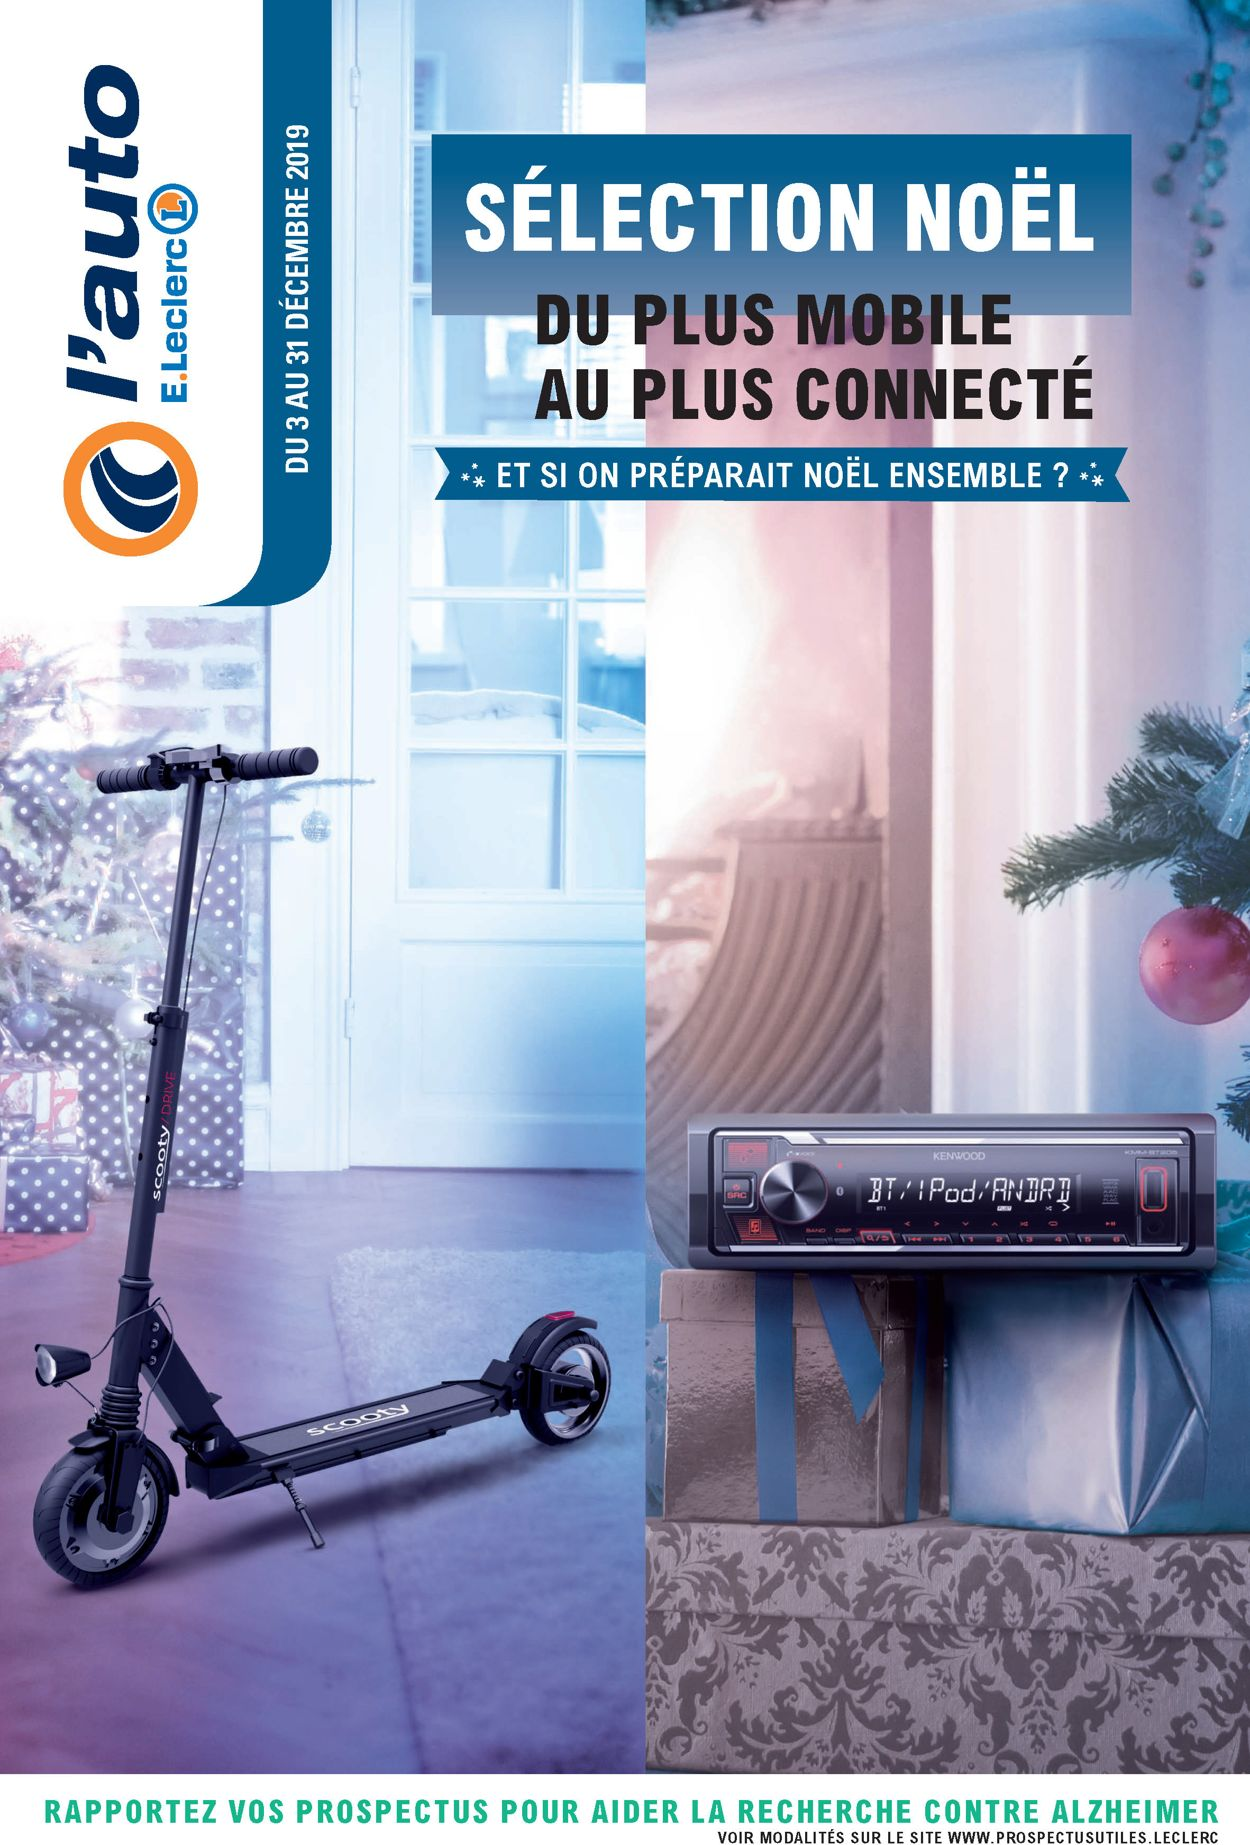 E.leclerc catalogue de Noël 2019 Catalogue - 03.12-31.12.2019